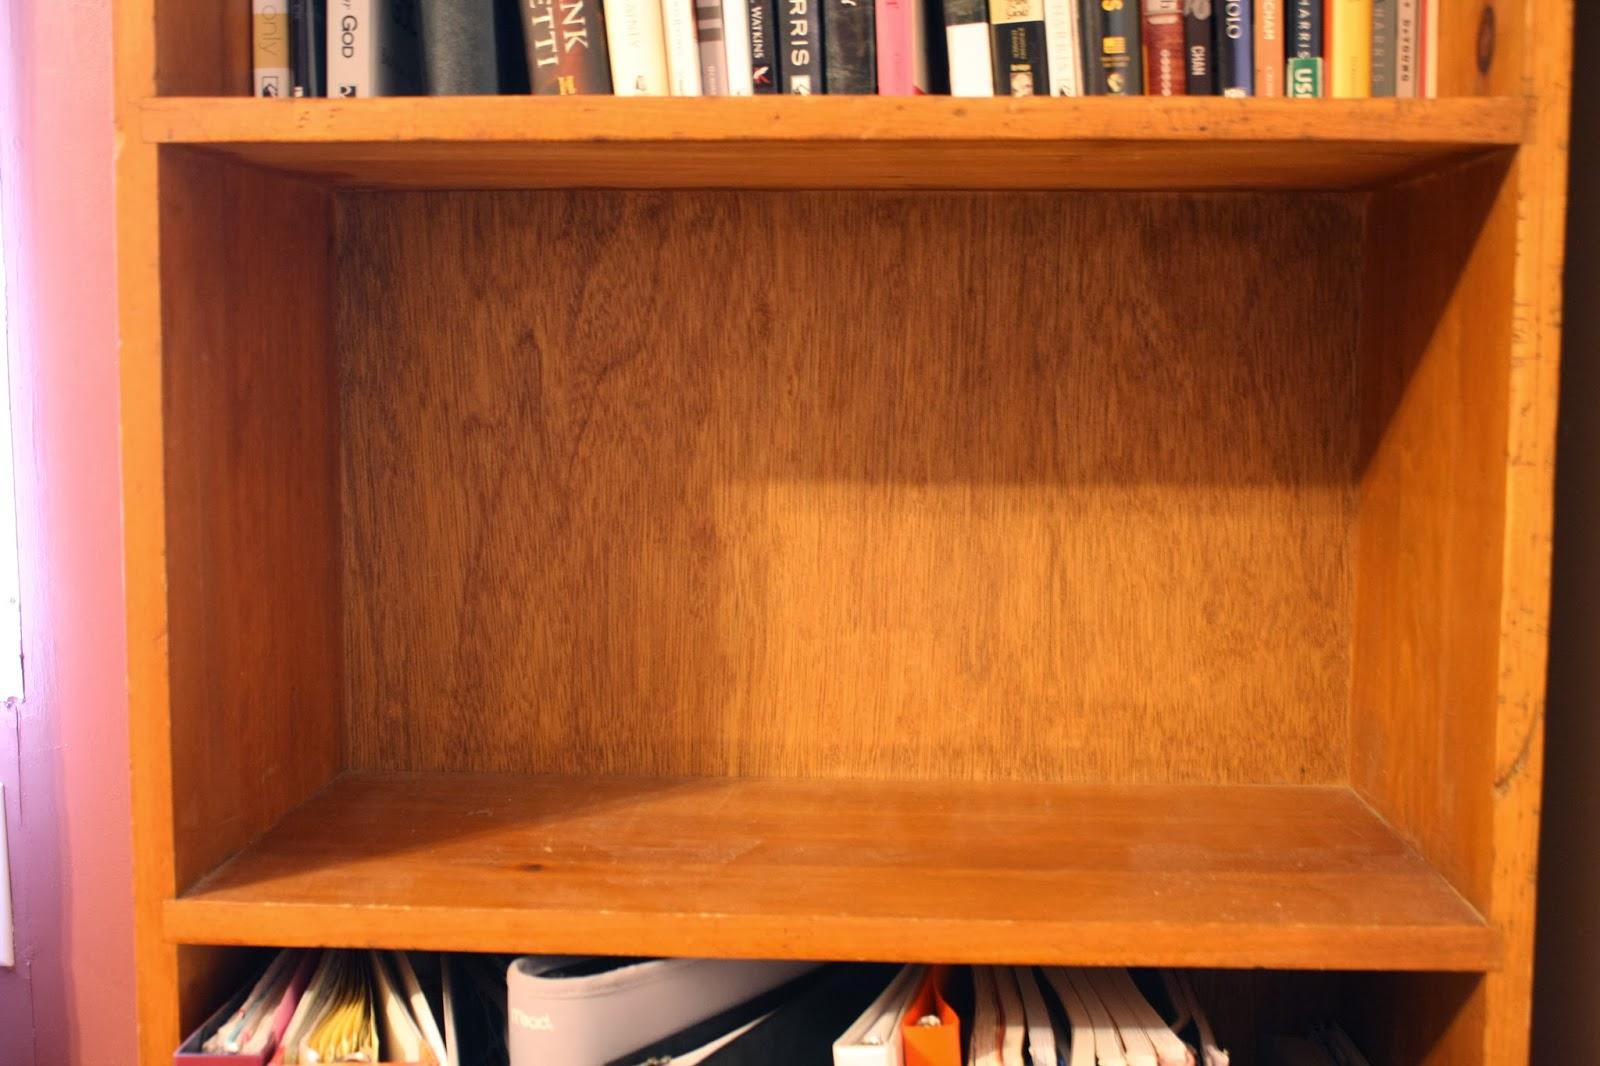 The Castilles The Empty Shelf Challenge